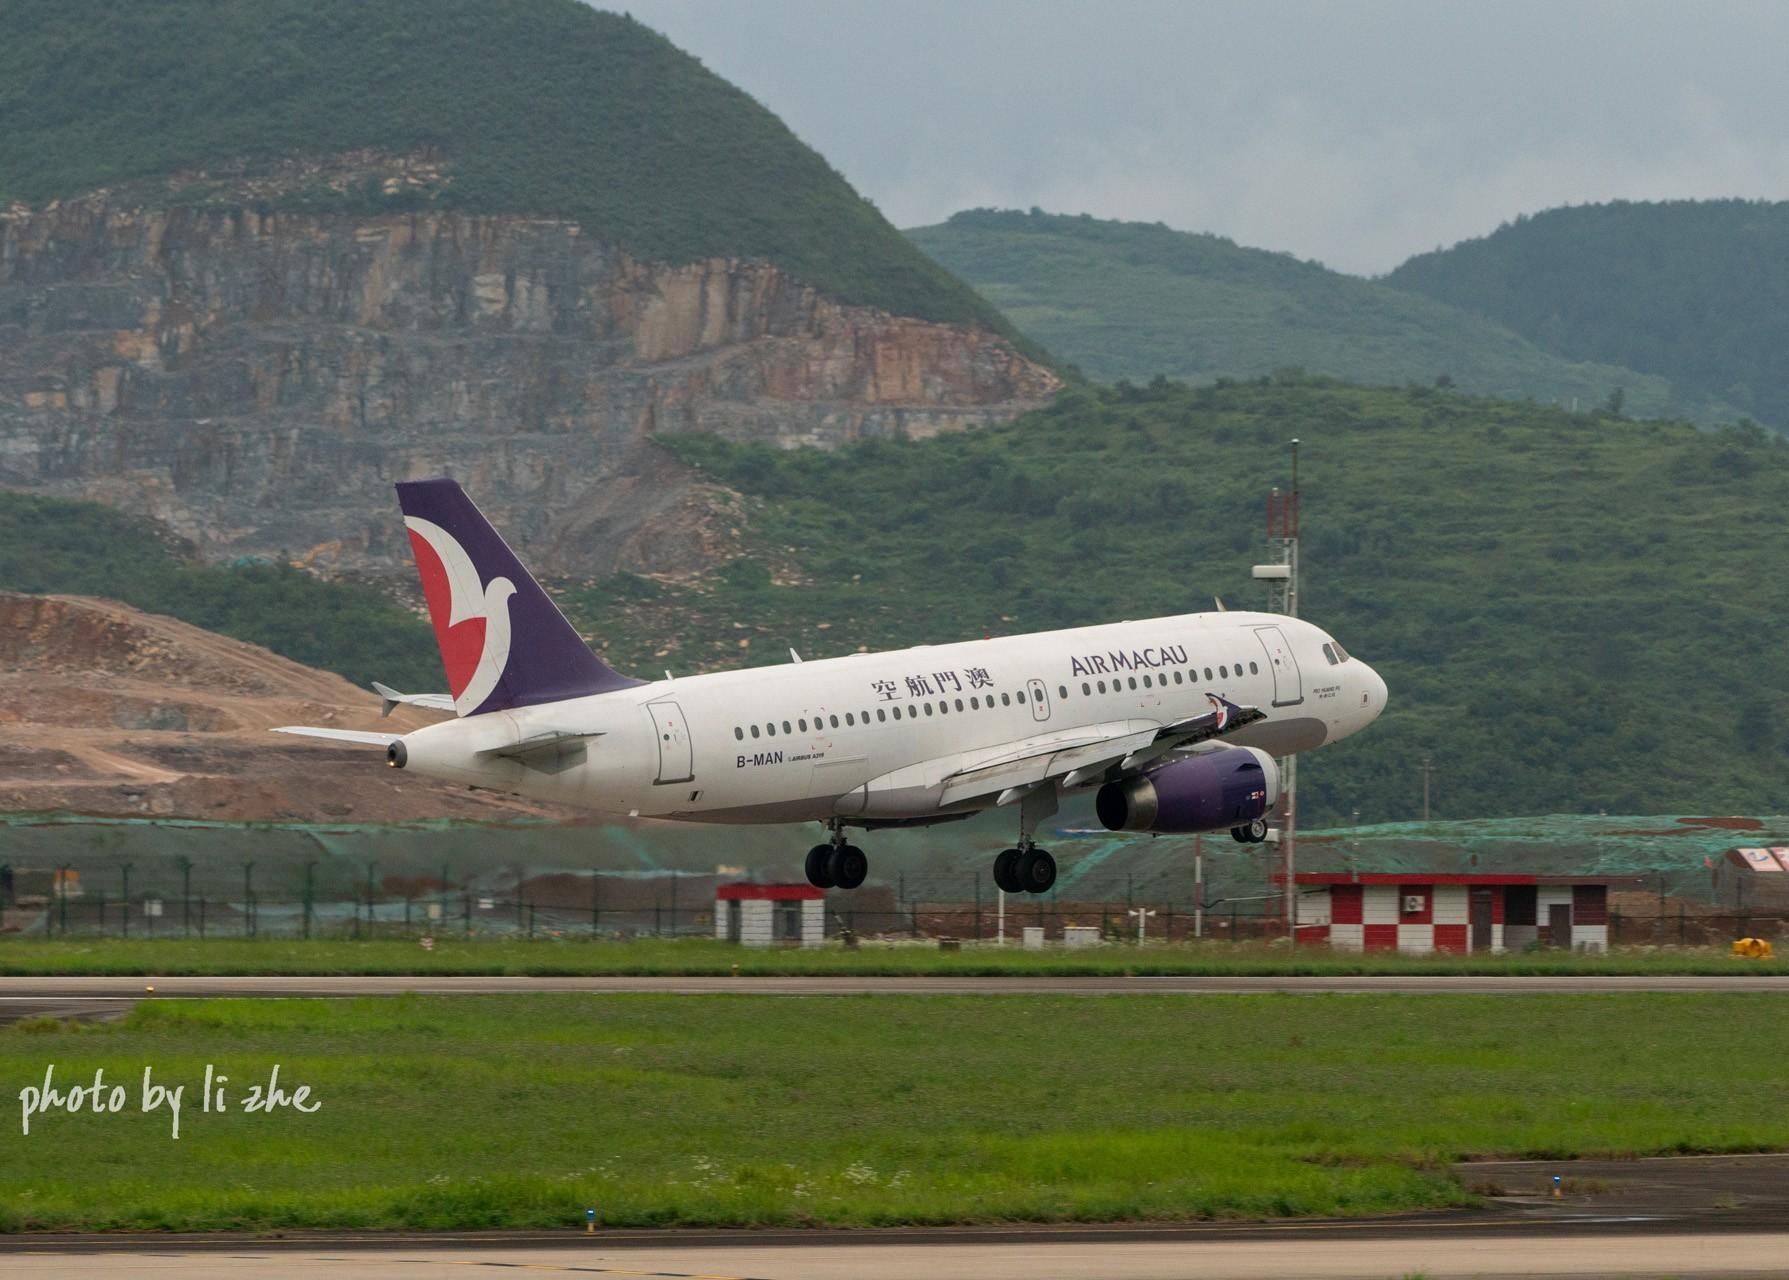 Re:[原创](KWE)贵阳机场两重天拍机 AIRBUS A319-100 B-MAN 中国贵阳龙洞堡国际机场